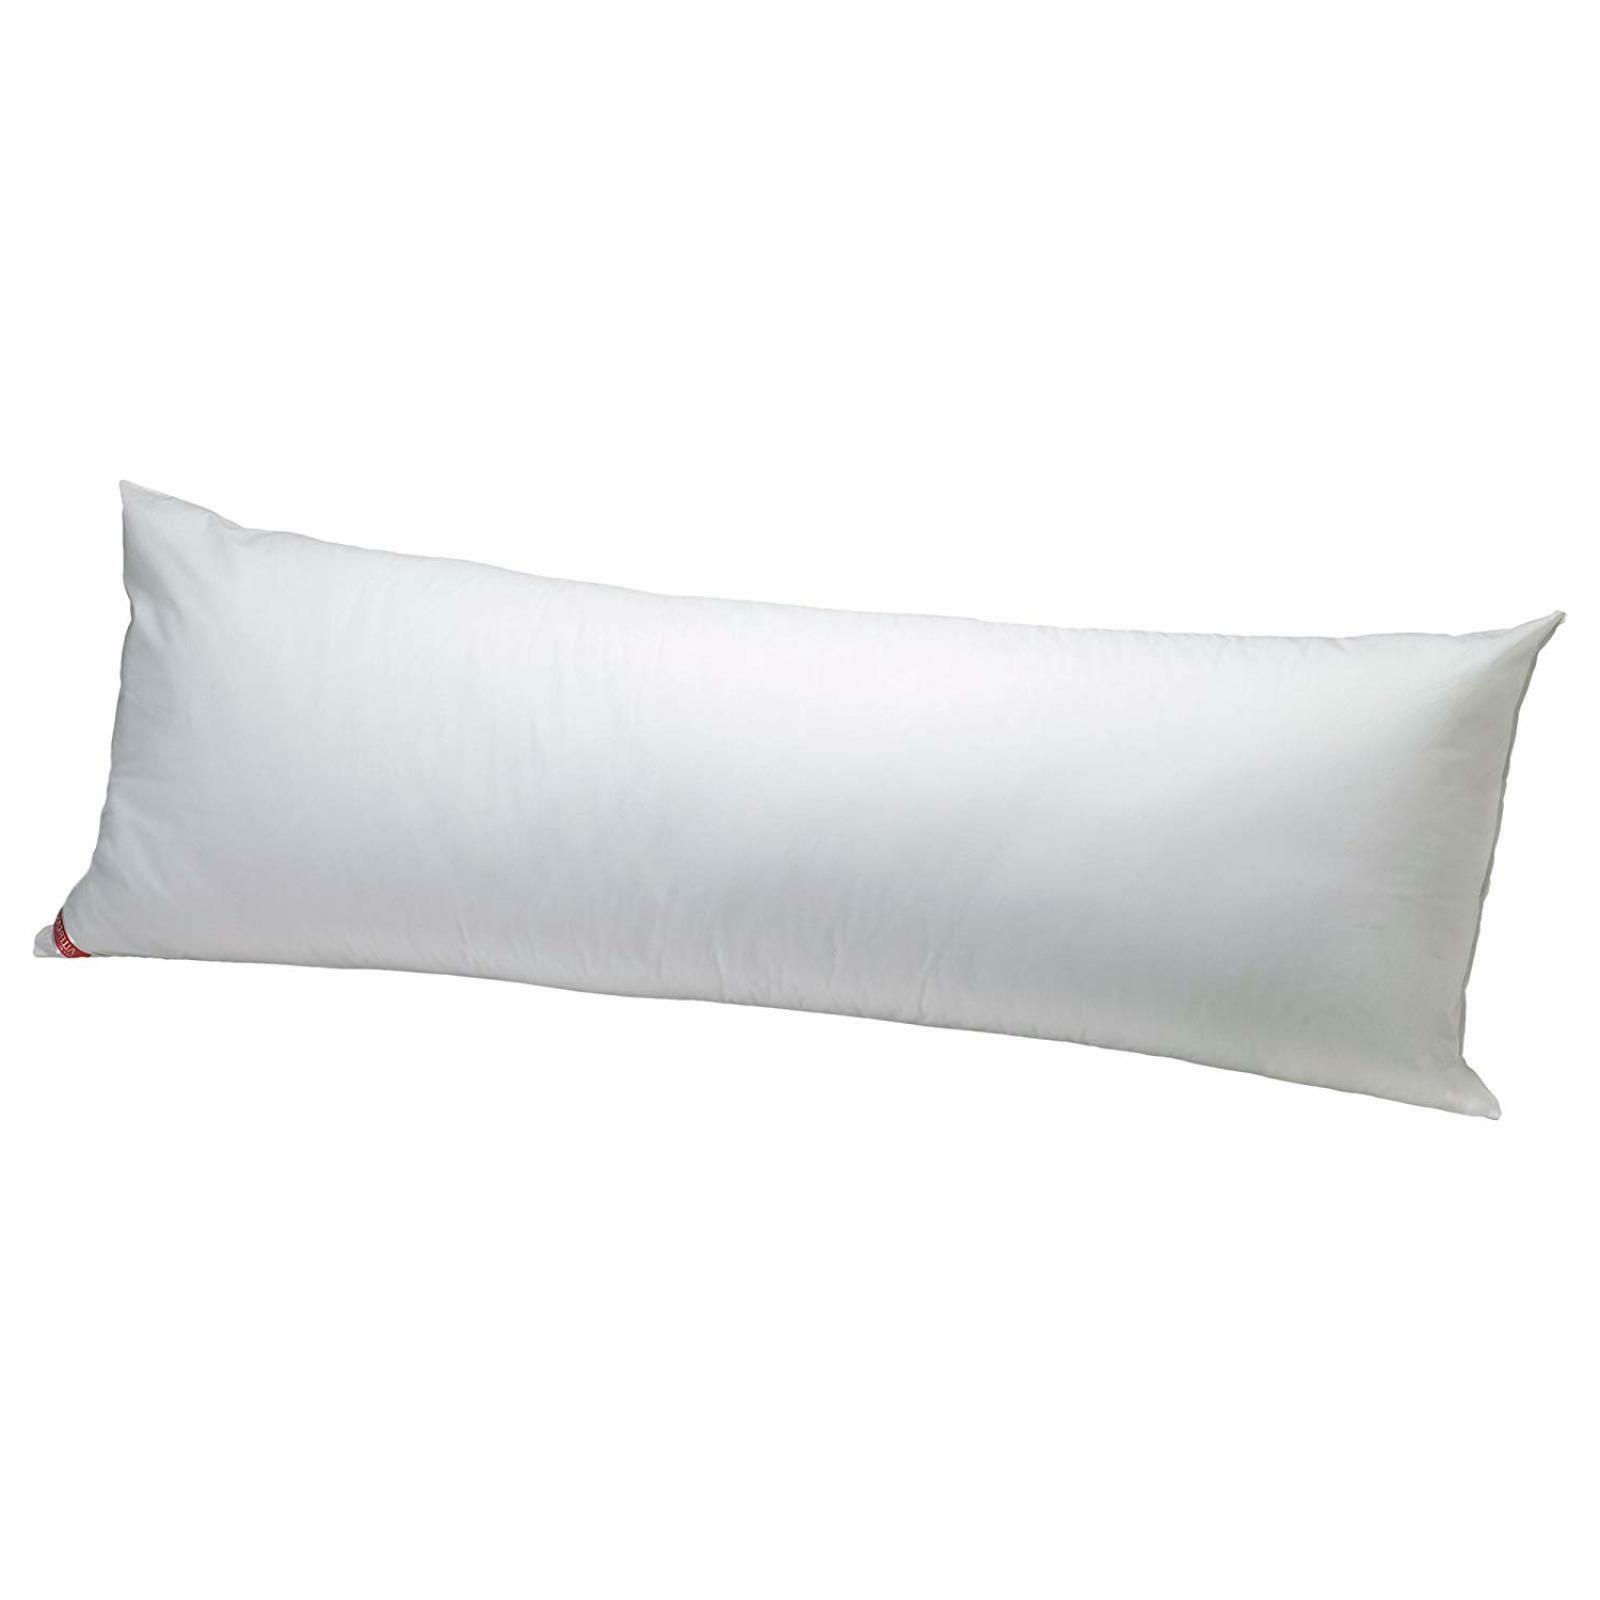 cotton allergy protection pillow